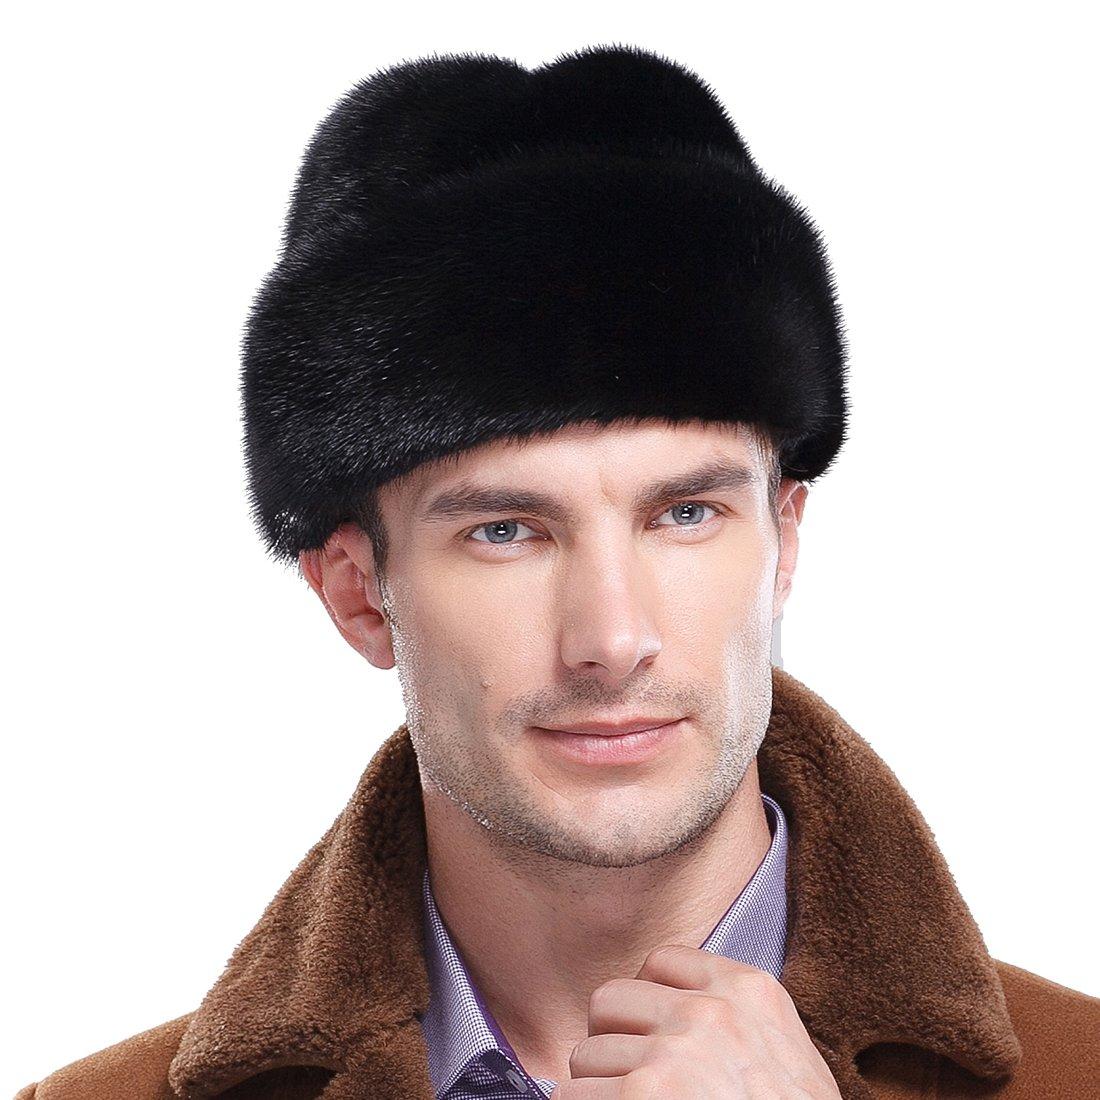 URSFUR Mink Full Fur Russian Cossack Hat (One Size, Black) by URSFUR